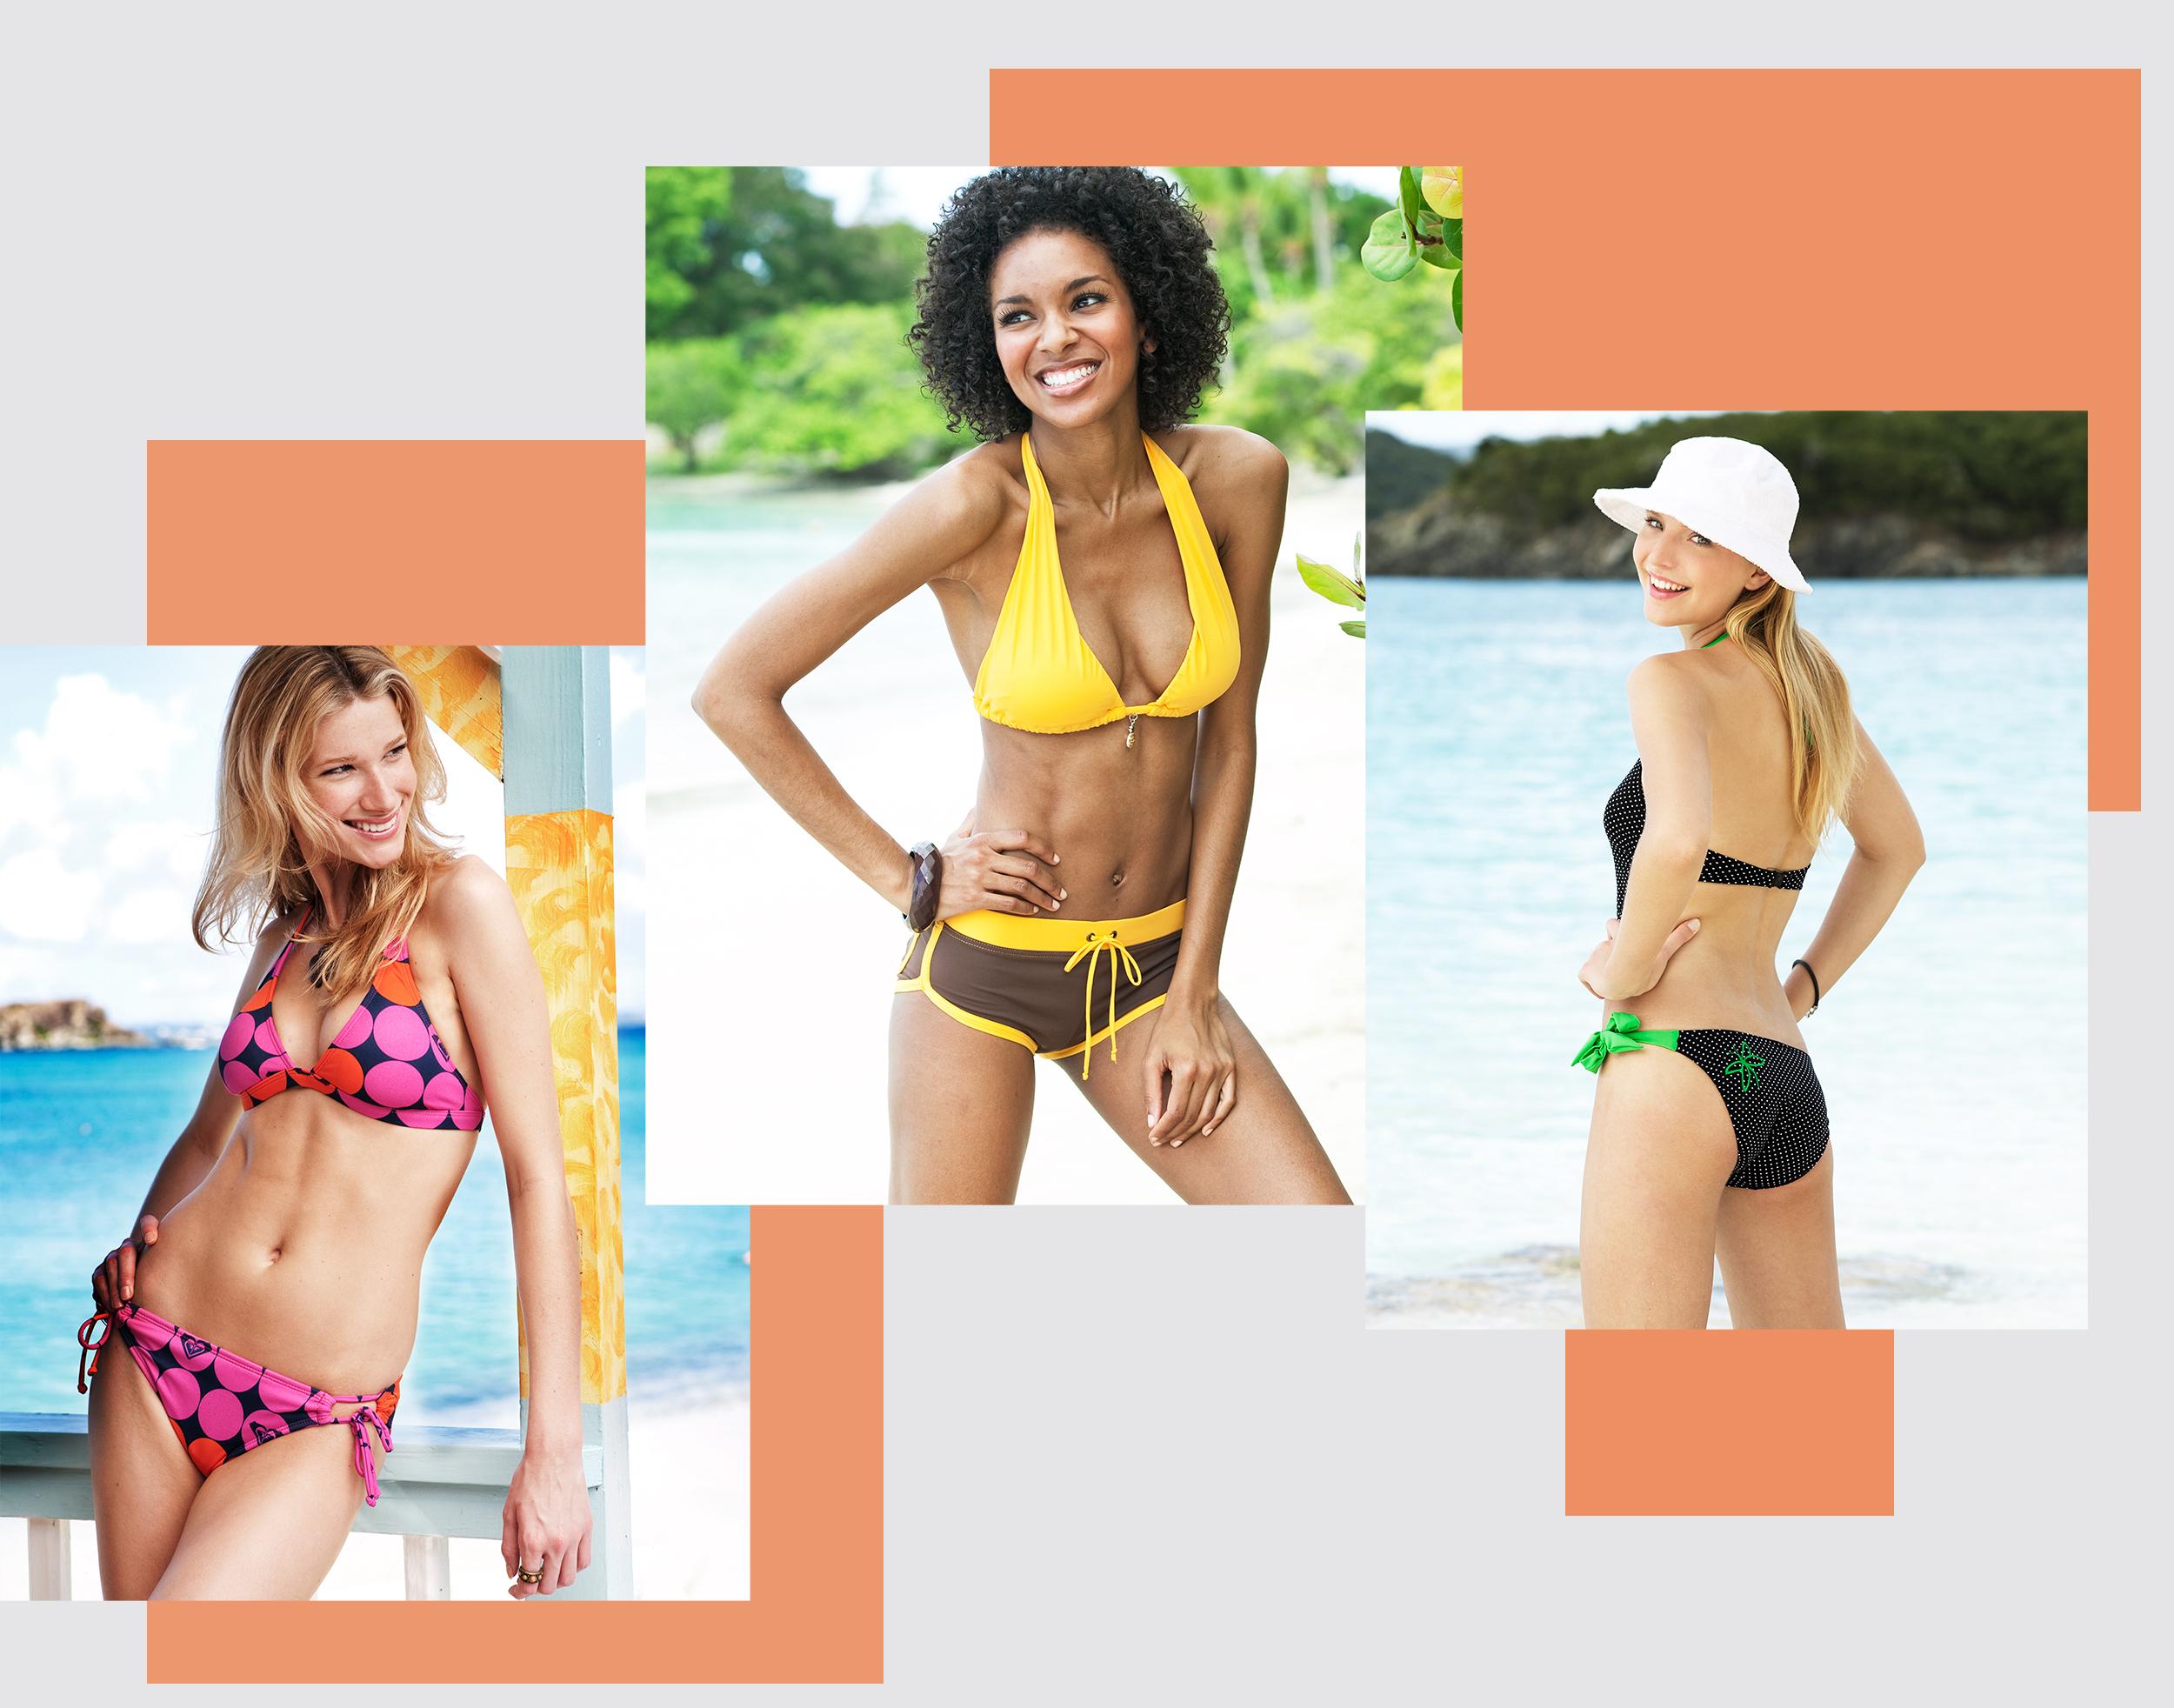 Advertising_Fashion_Swim_01.jpg